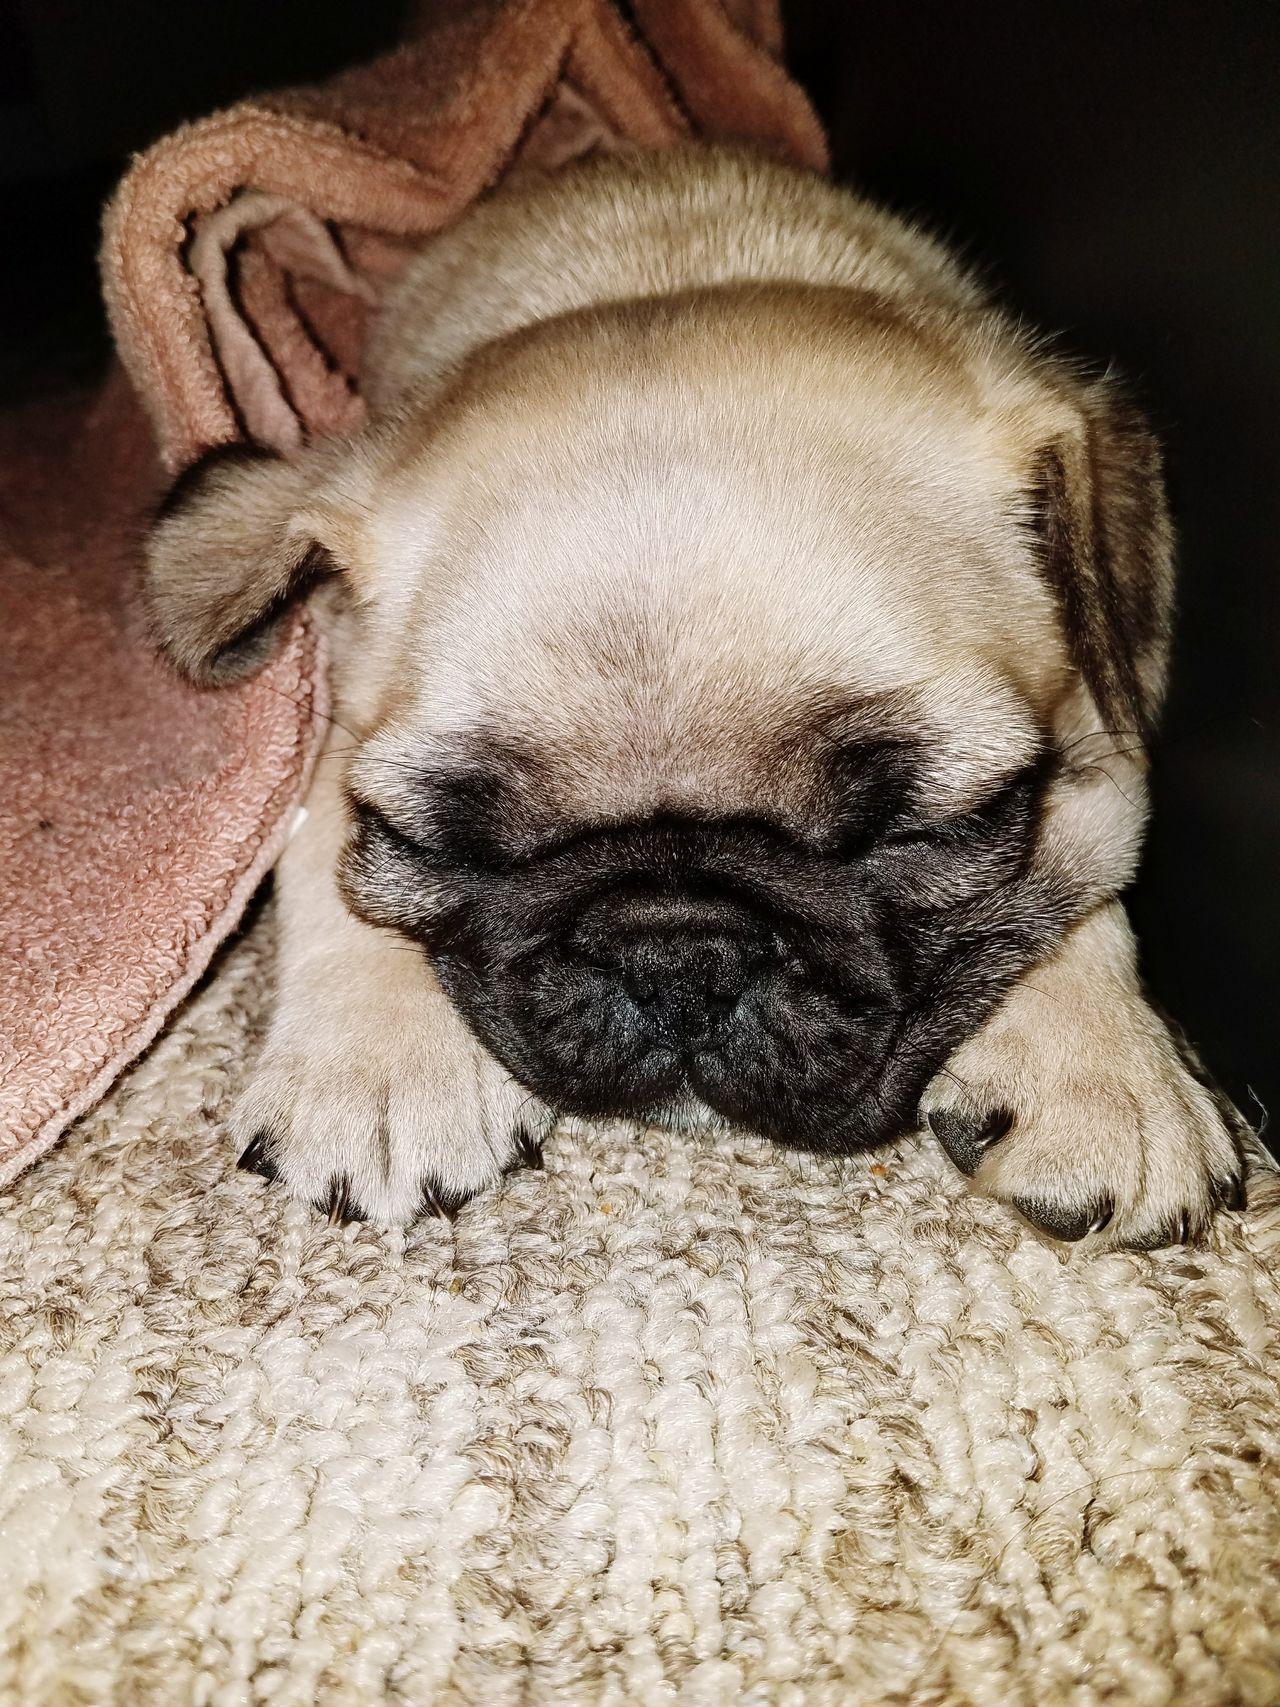 Indoors  Pets Close-up Animal Themes Domestic Animals Pug Girl Pug Sleeping Puglover Pug Puppy Pug Life ❤ Puglife Pug Day Mammal No People Indoors